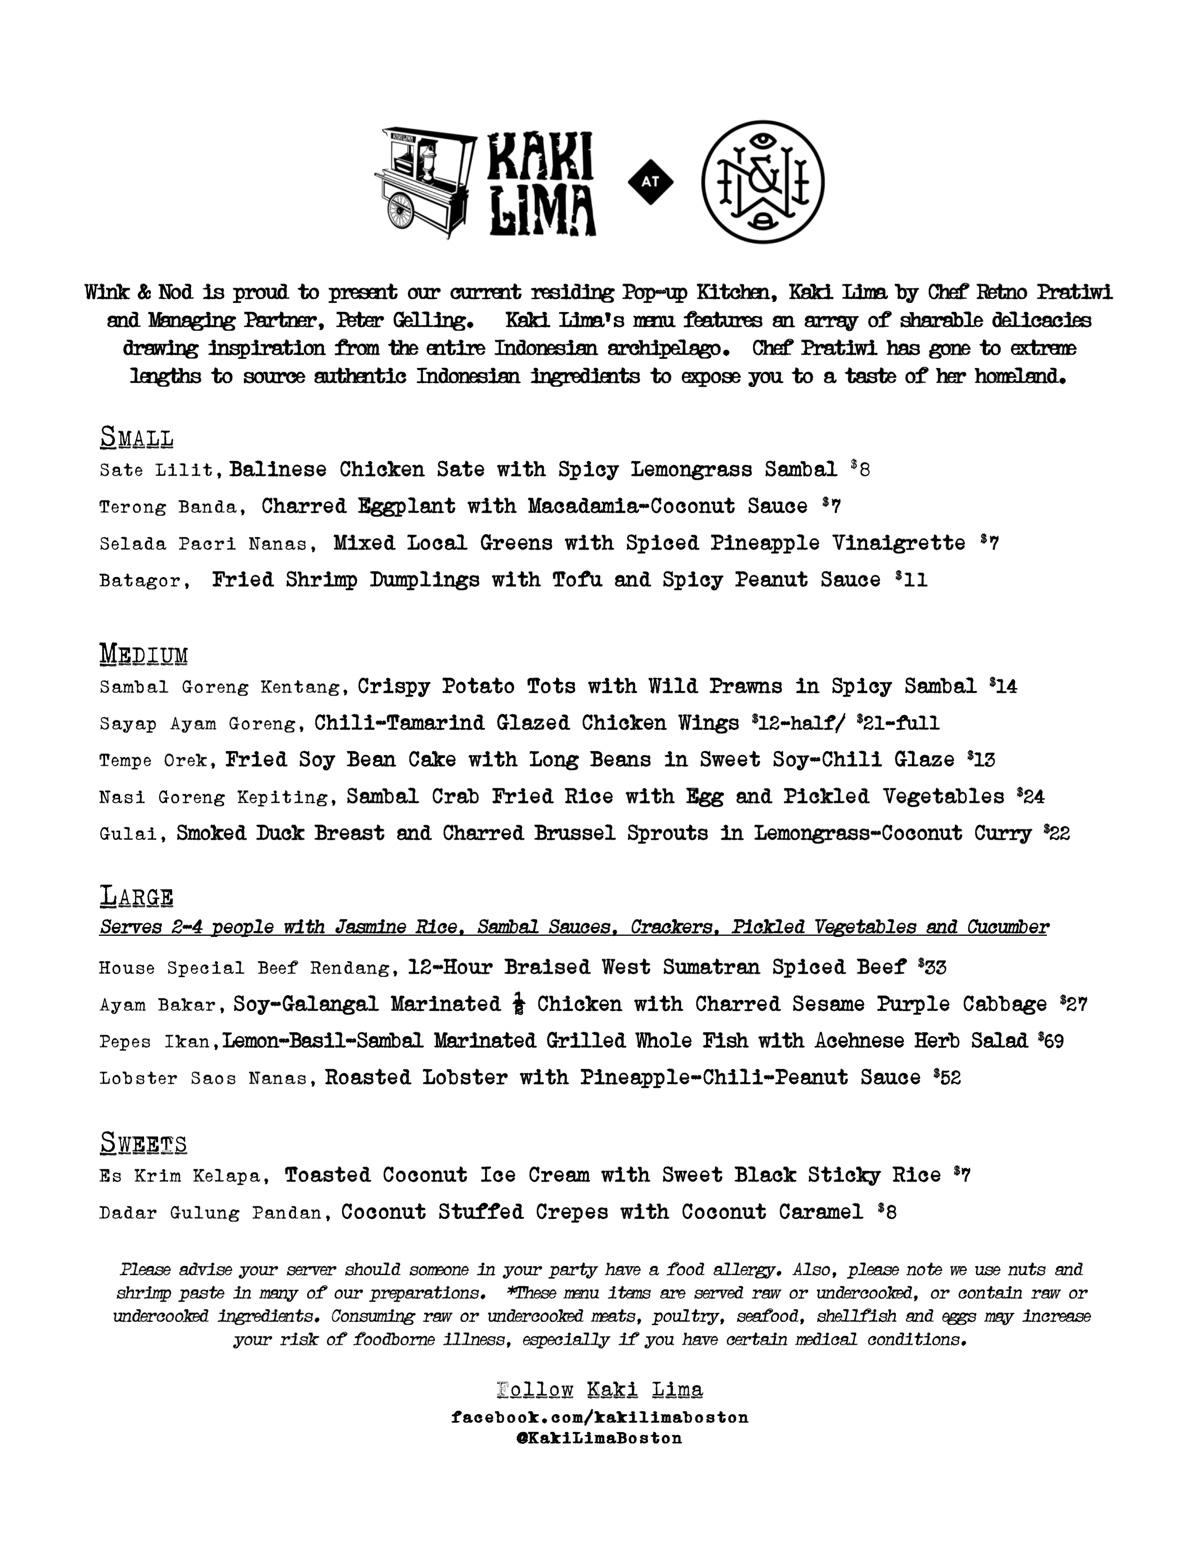 The menu for Kaki Lima at Wink & Nod